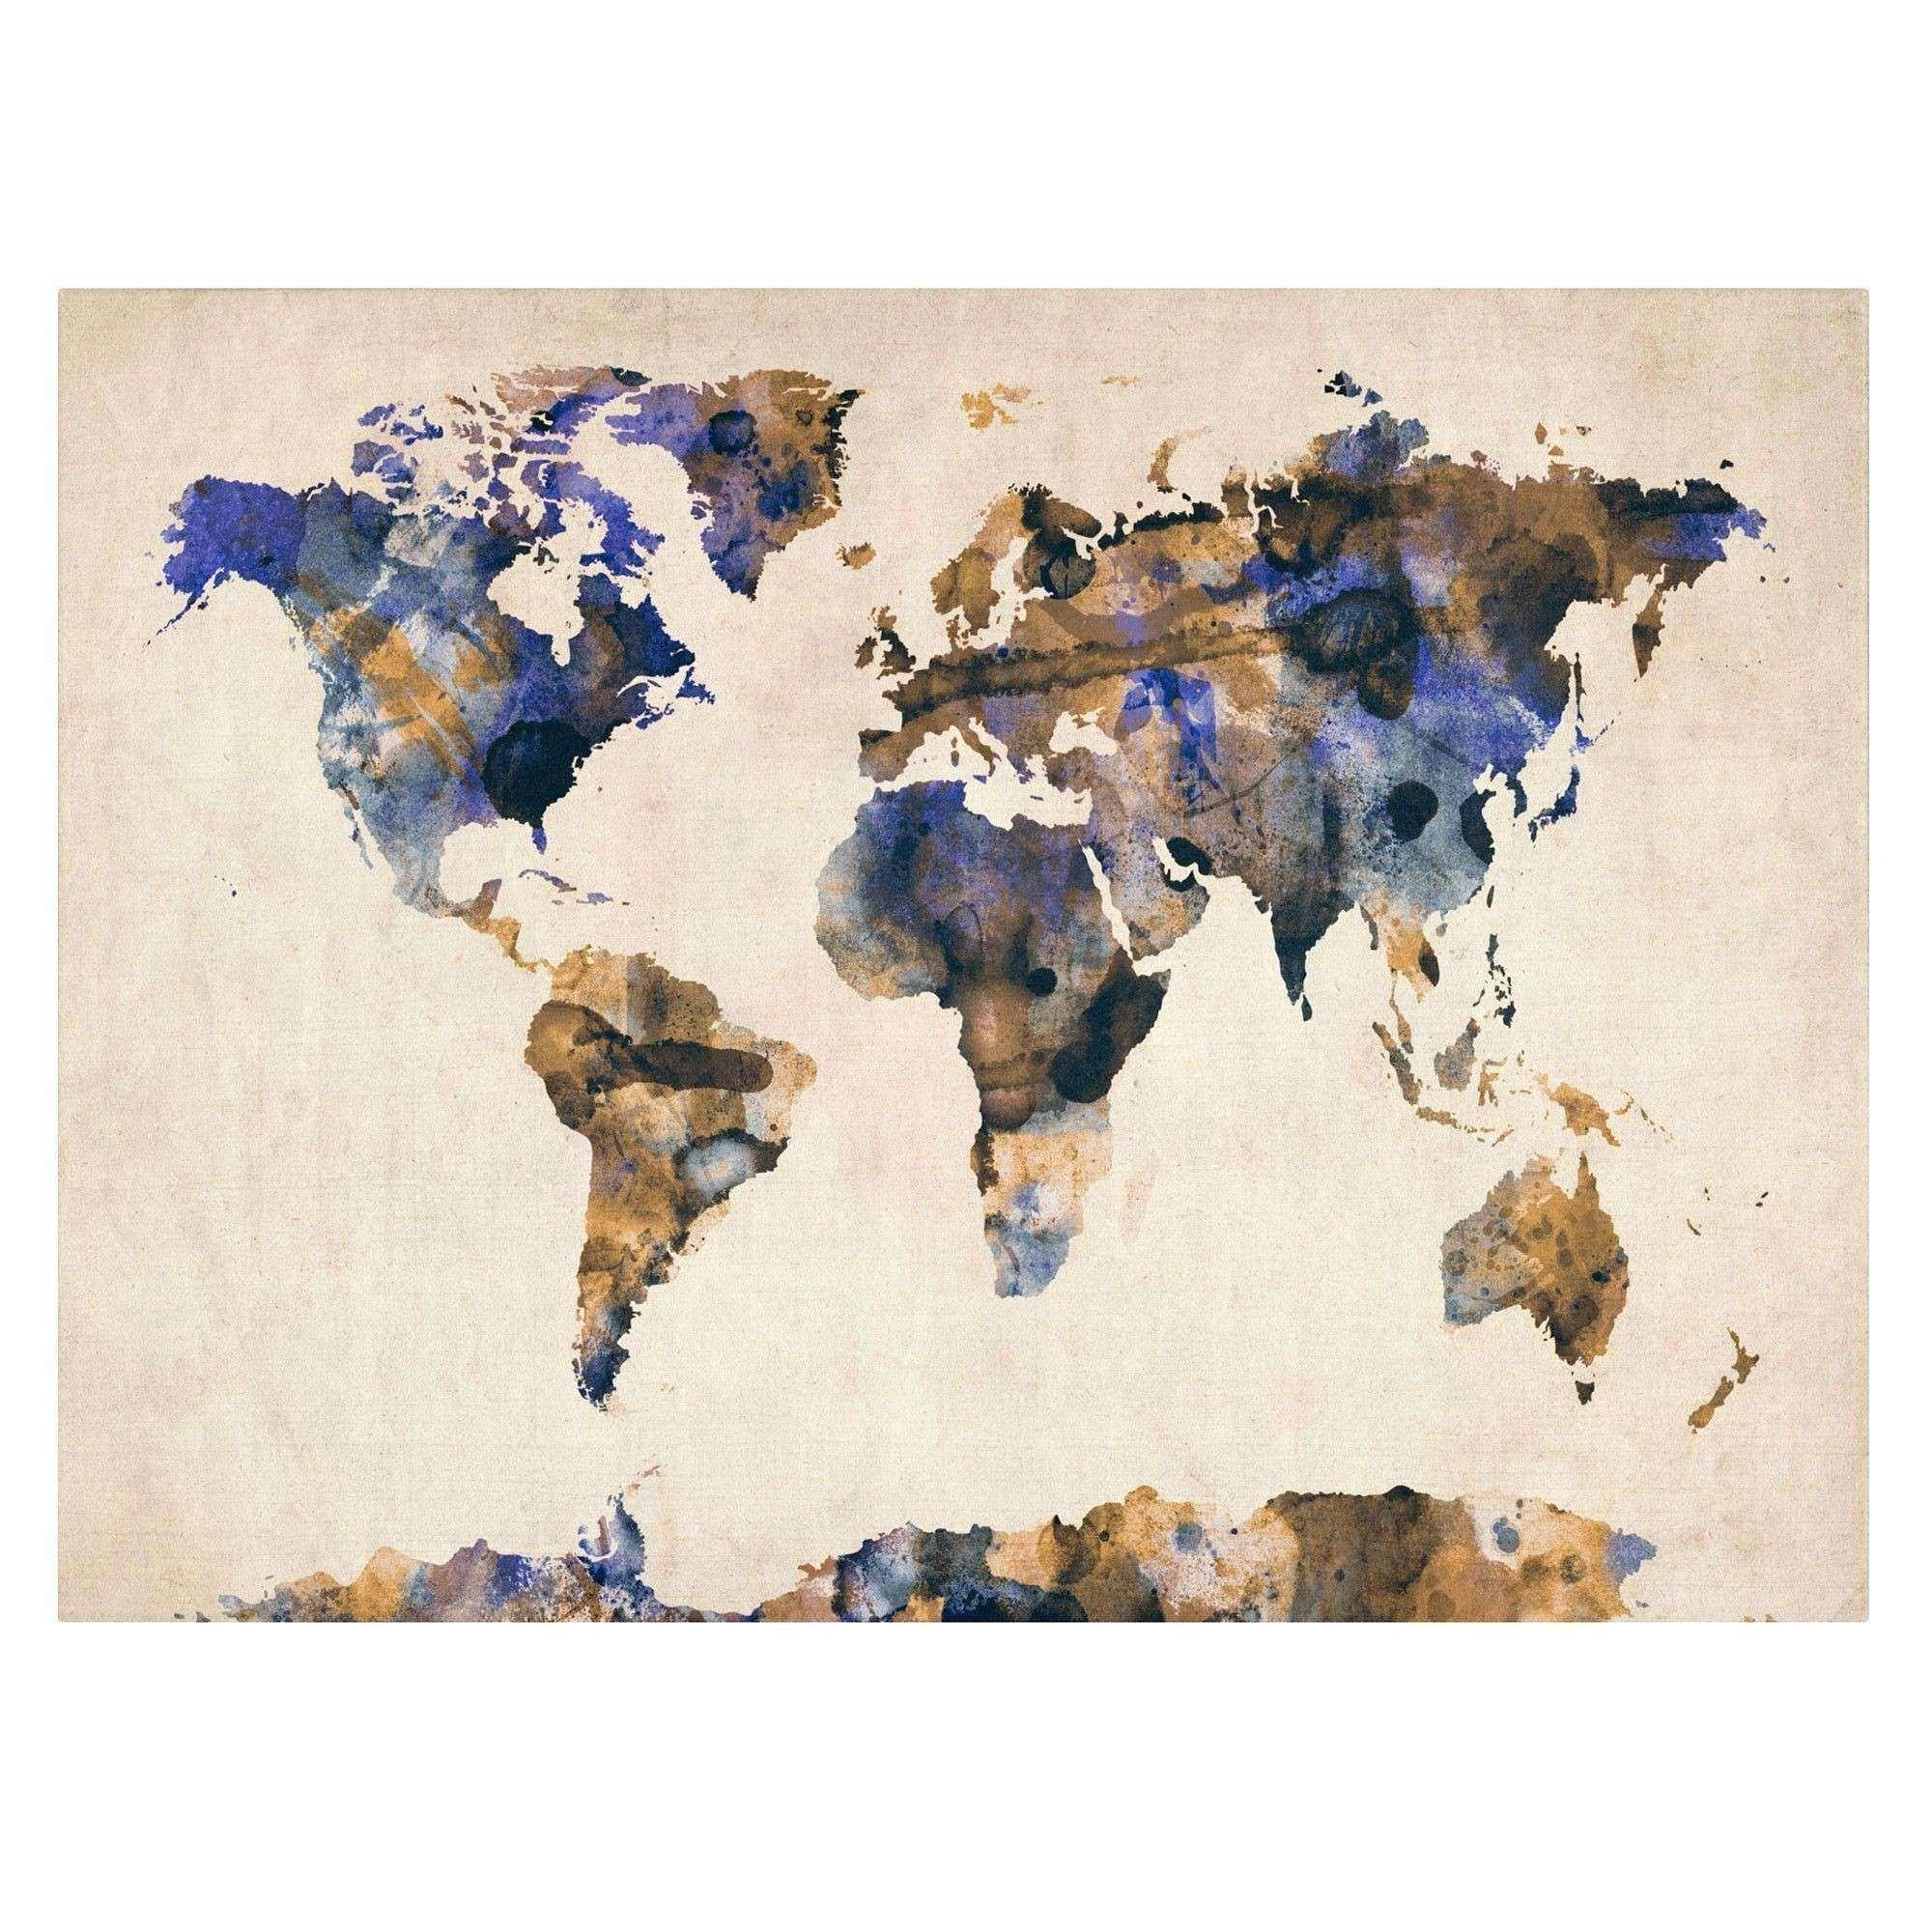 World Map Prints Wall Art Fresh Joss And Main Wall Art Pinterest In Joss And Main Wall Art (Image 20 of 20)